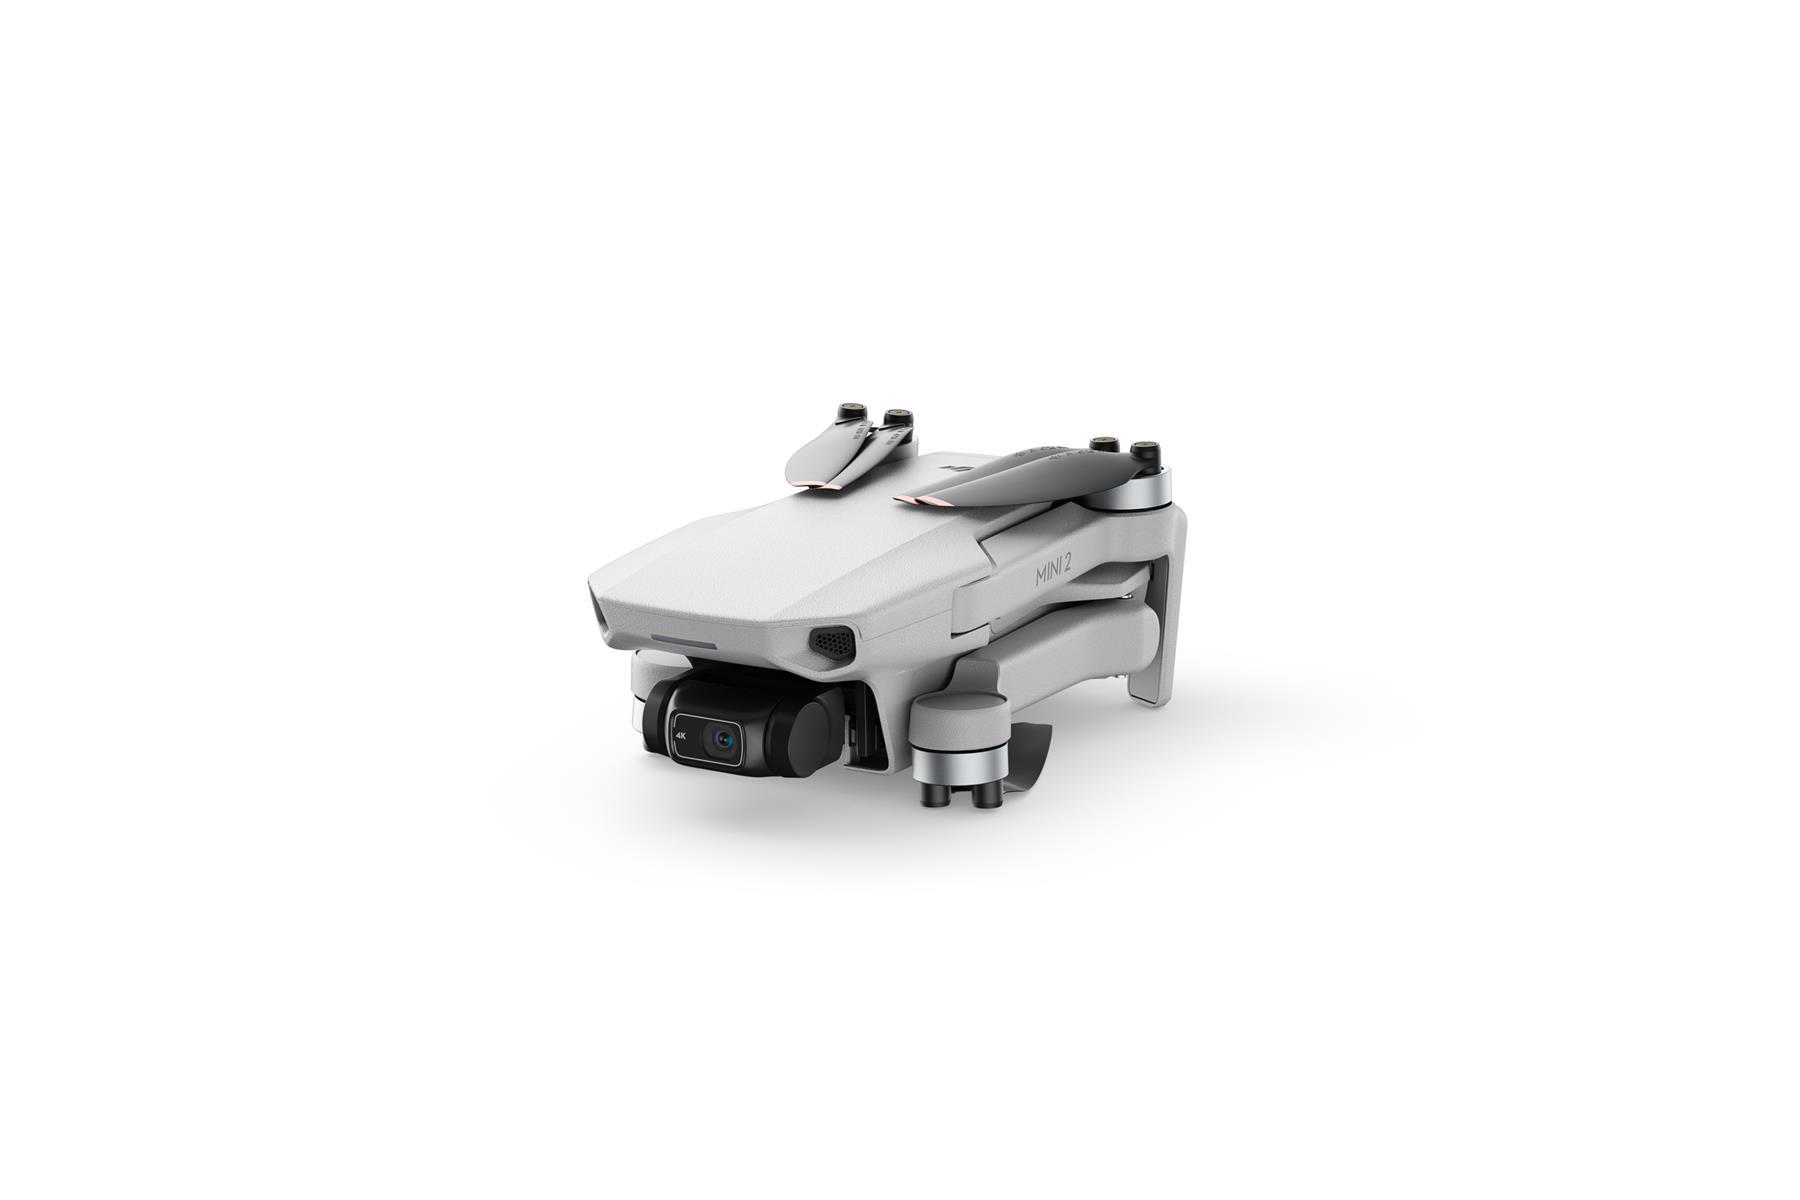 thumbnail 5 - DJI Mini 2 Standard/Combo - Ultralight and Foldable Drone Quadcopter - REFURB